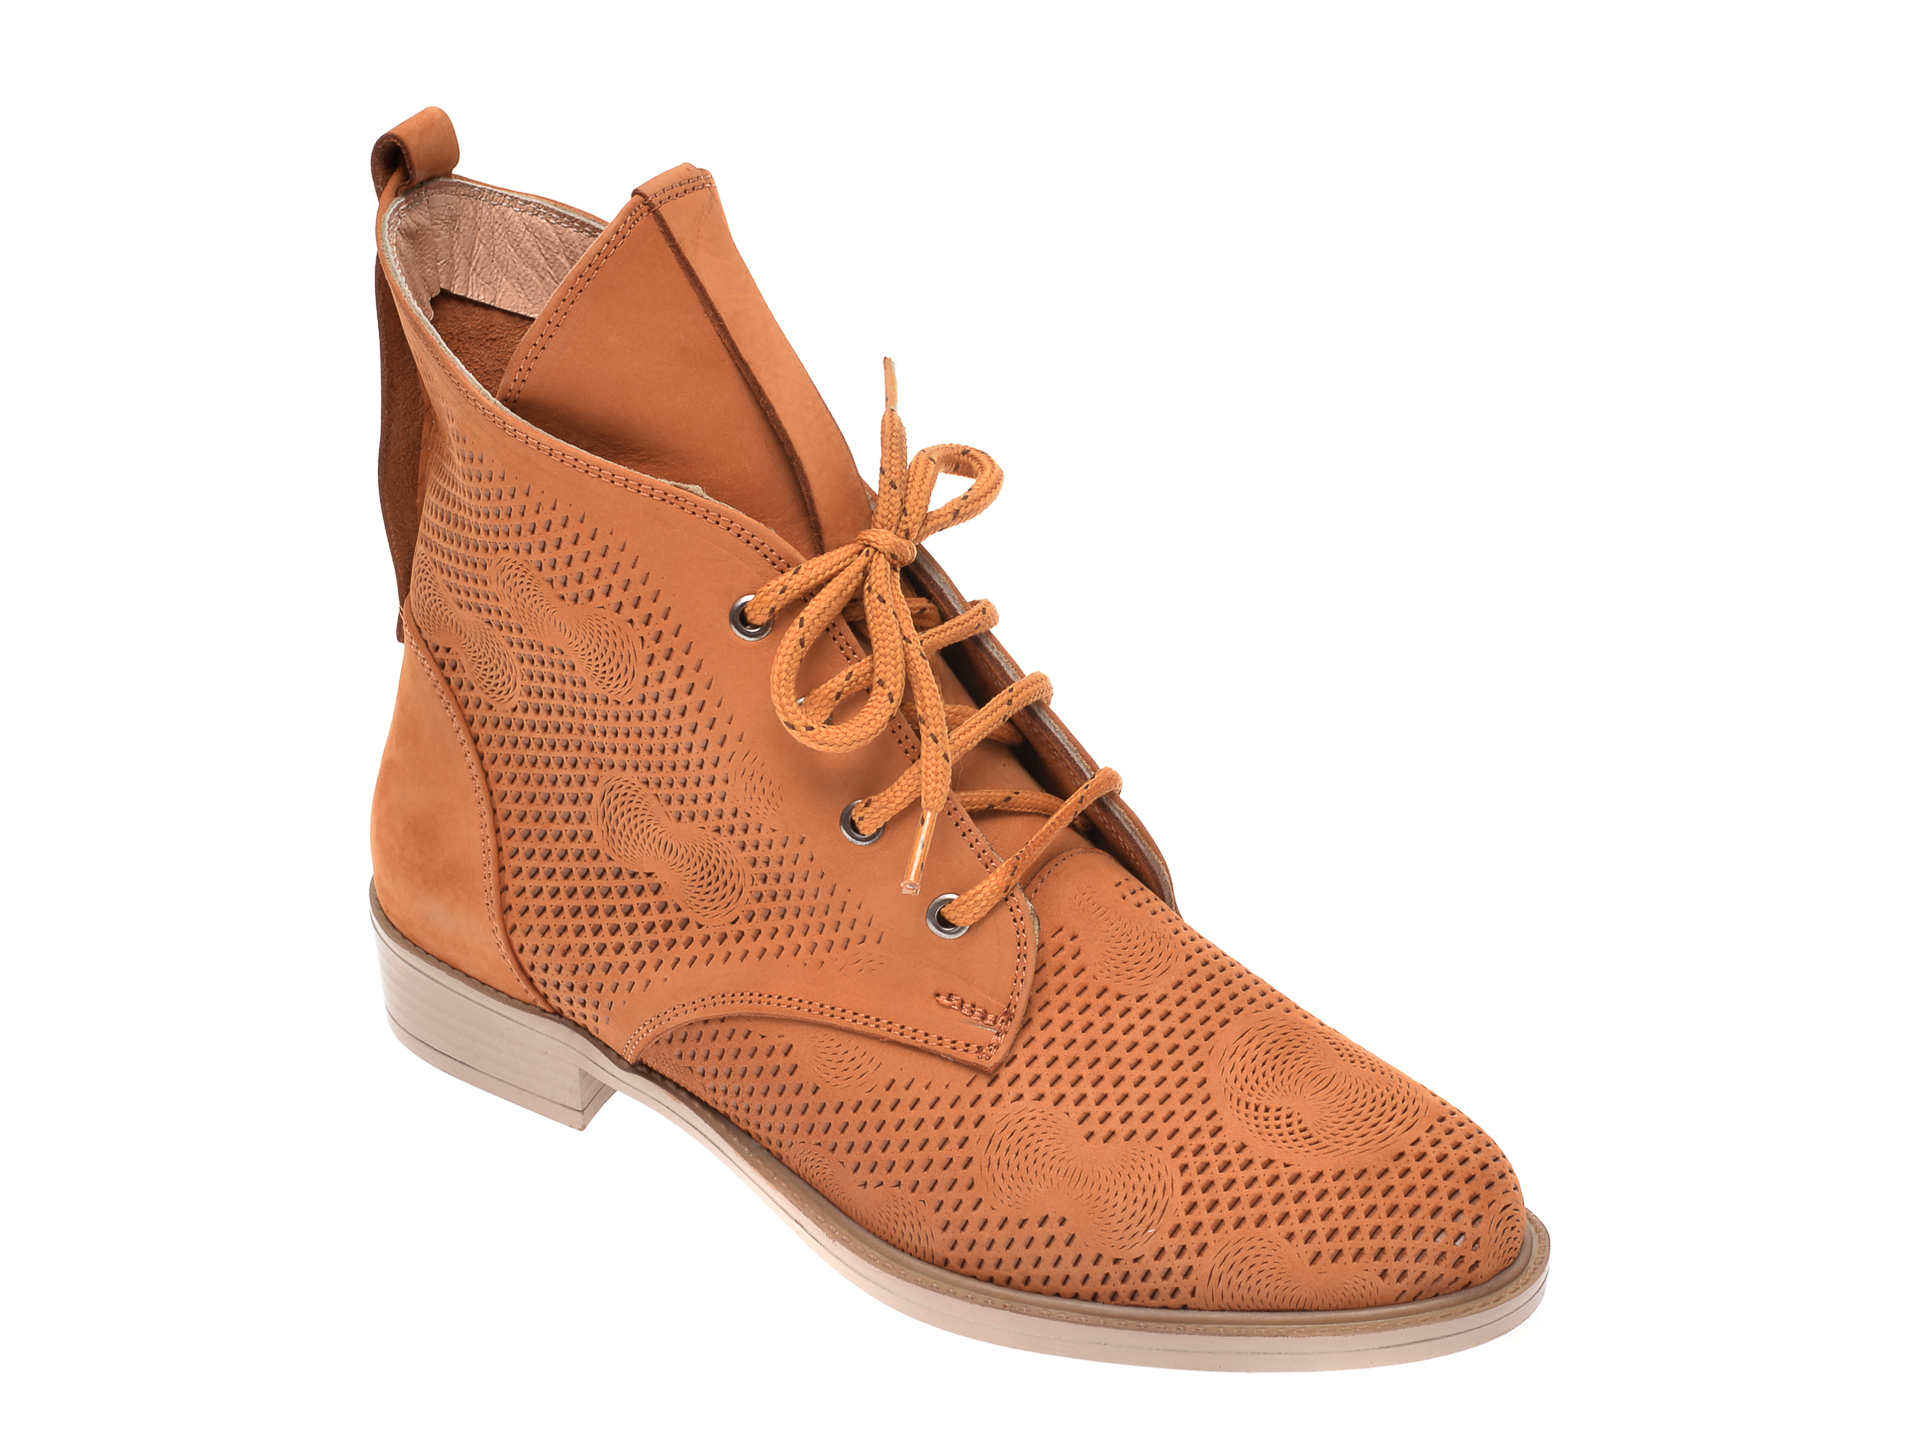 Pantofi FLAVIA PASSINI maro, 0511102, din nabuc